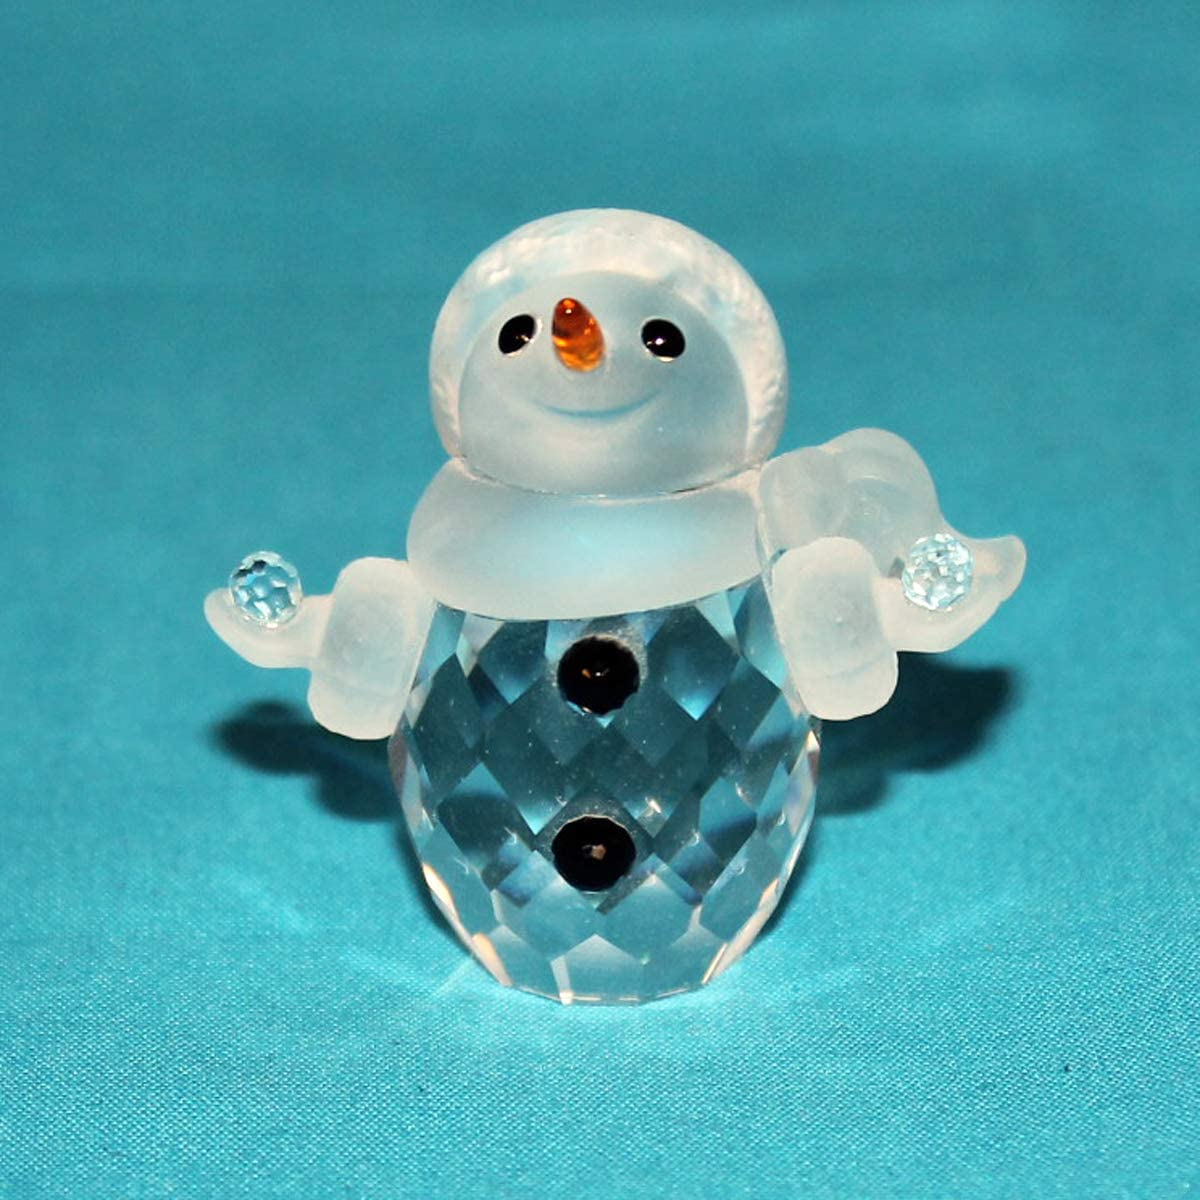 Swarovski Crystal Figurine 624572, Little Snowman